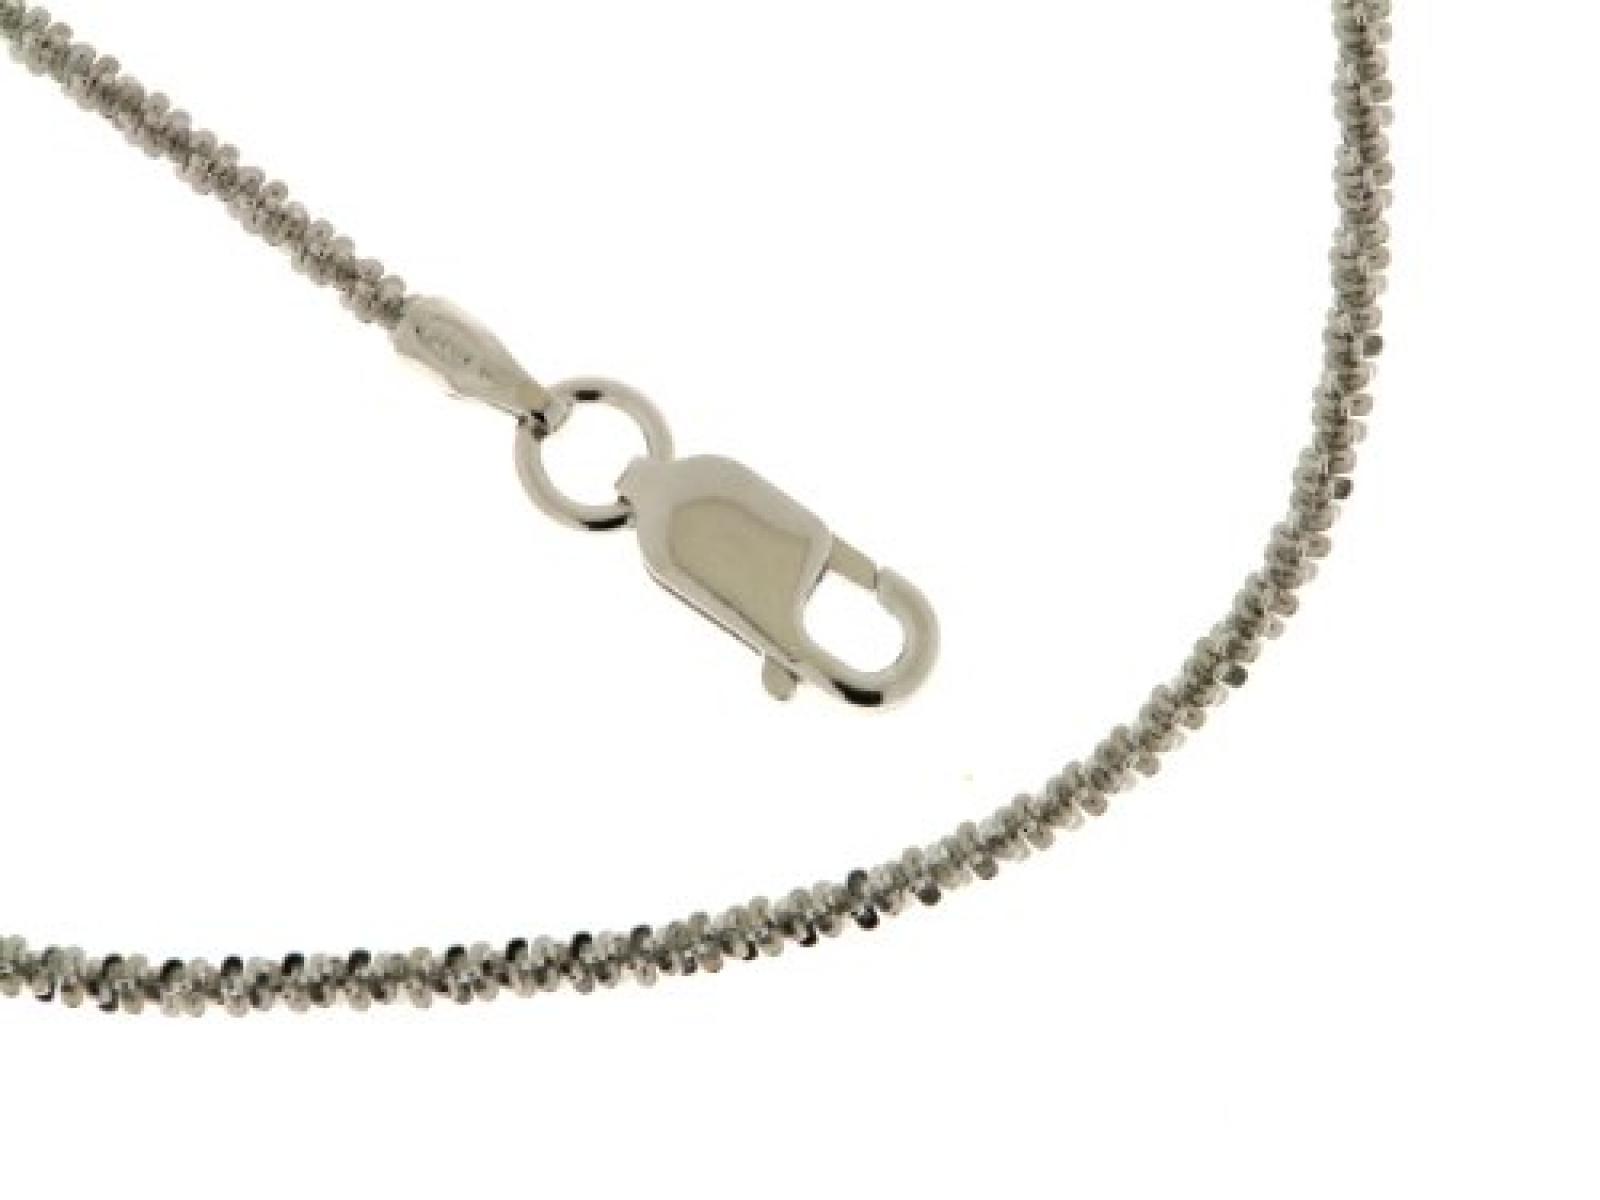 Kettenworld Damen-Halskette im Criss-Cross-Design 925 Sterling Silber 263222